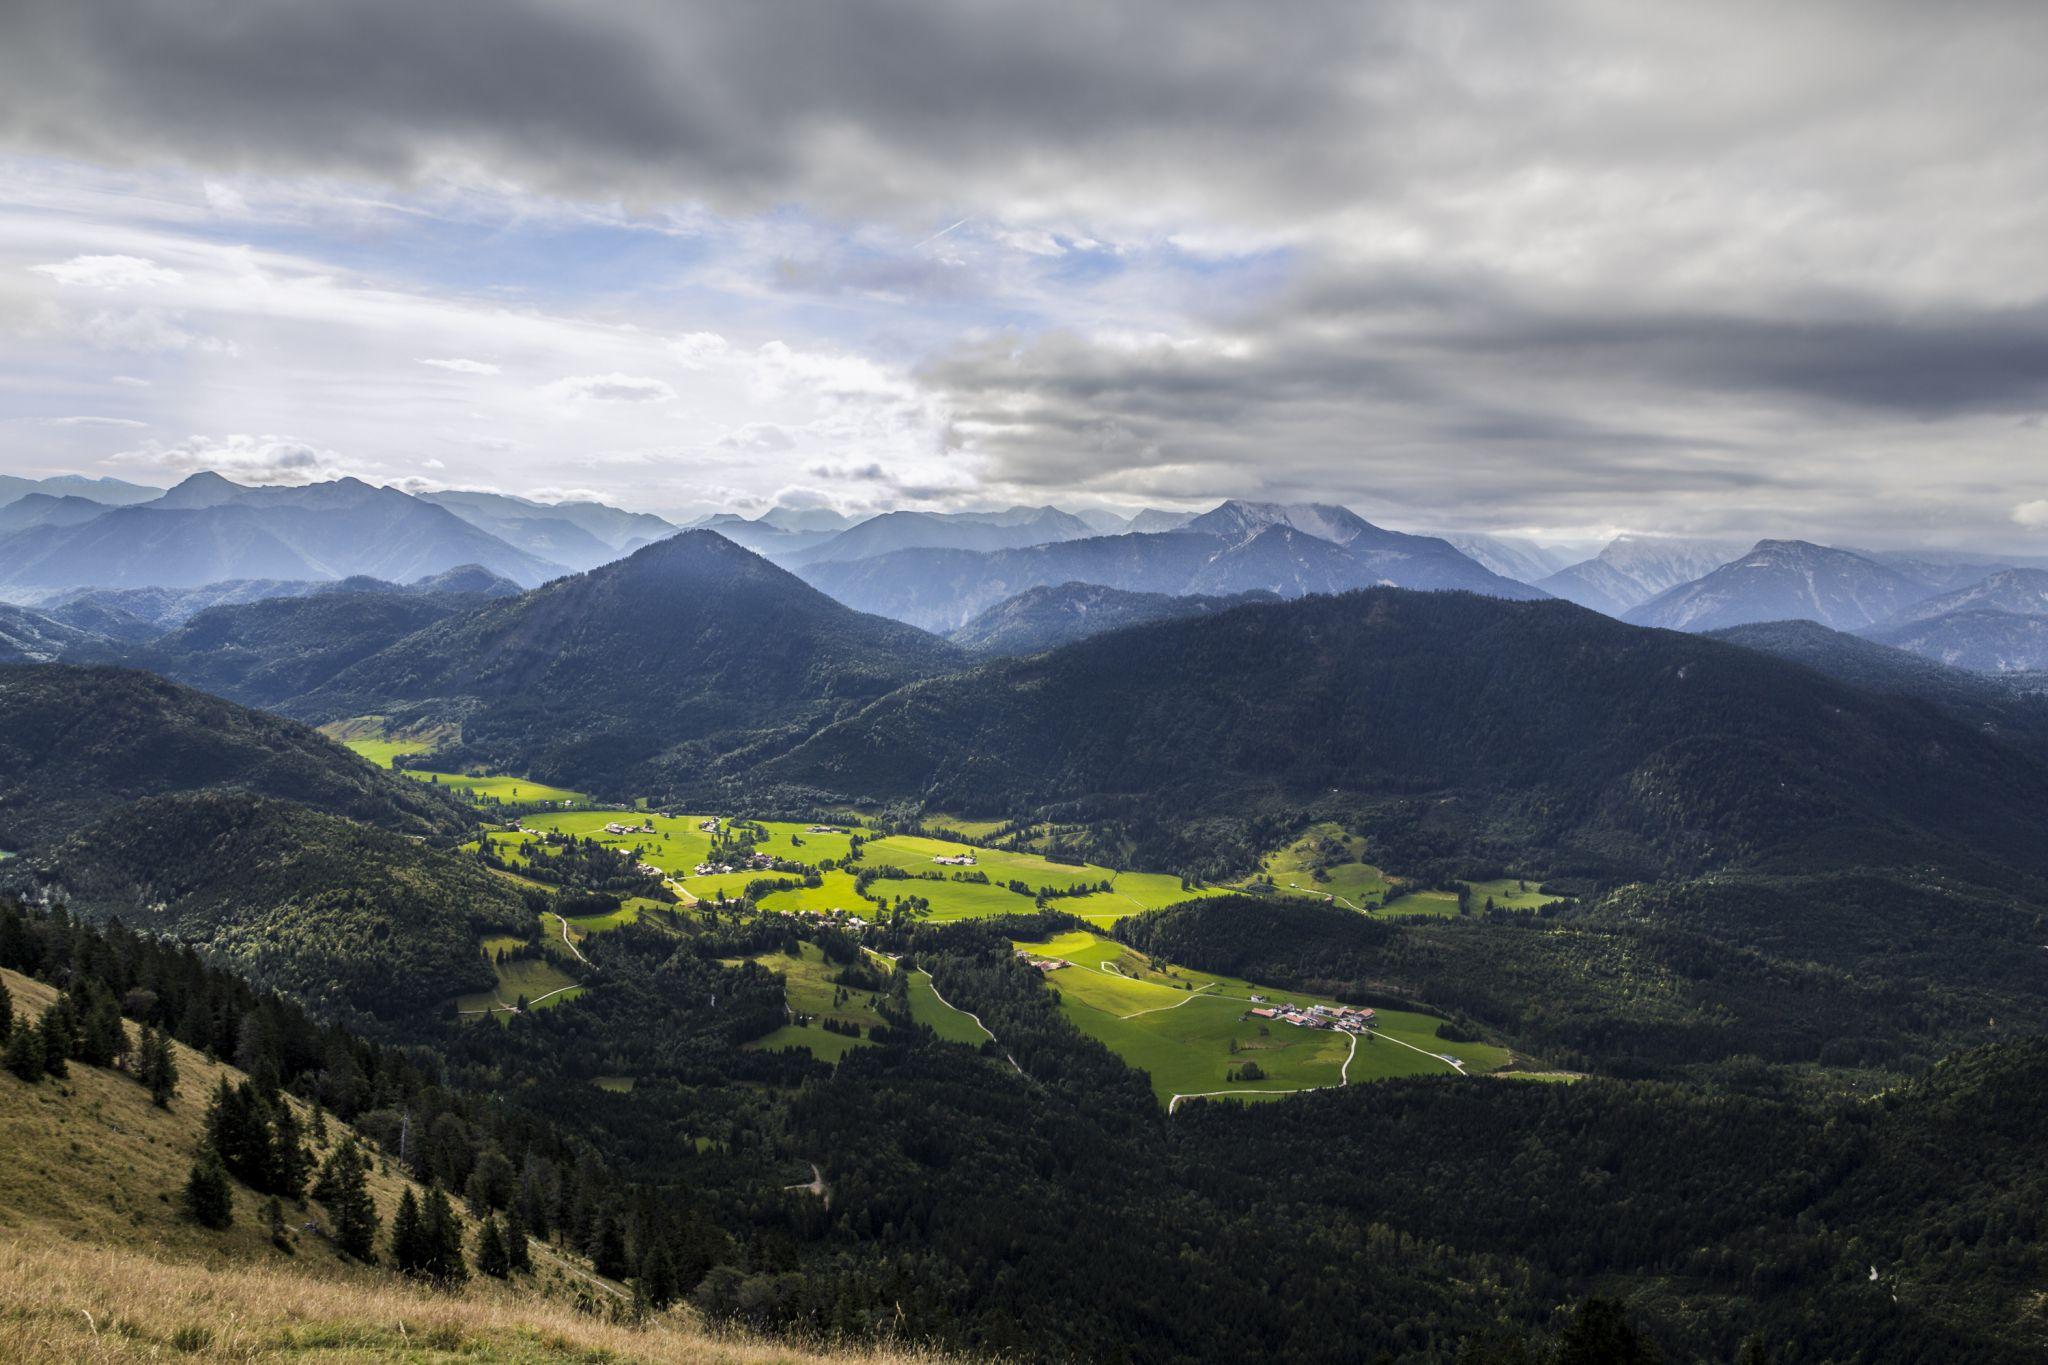 Hirschhörnlkopf, Germany